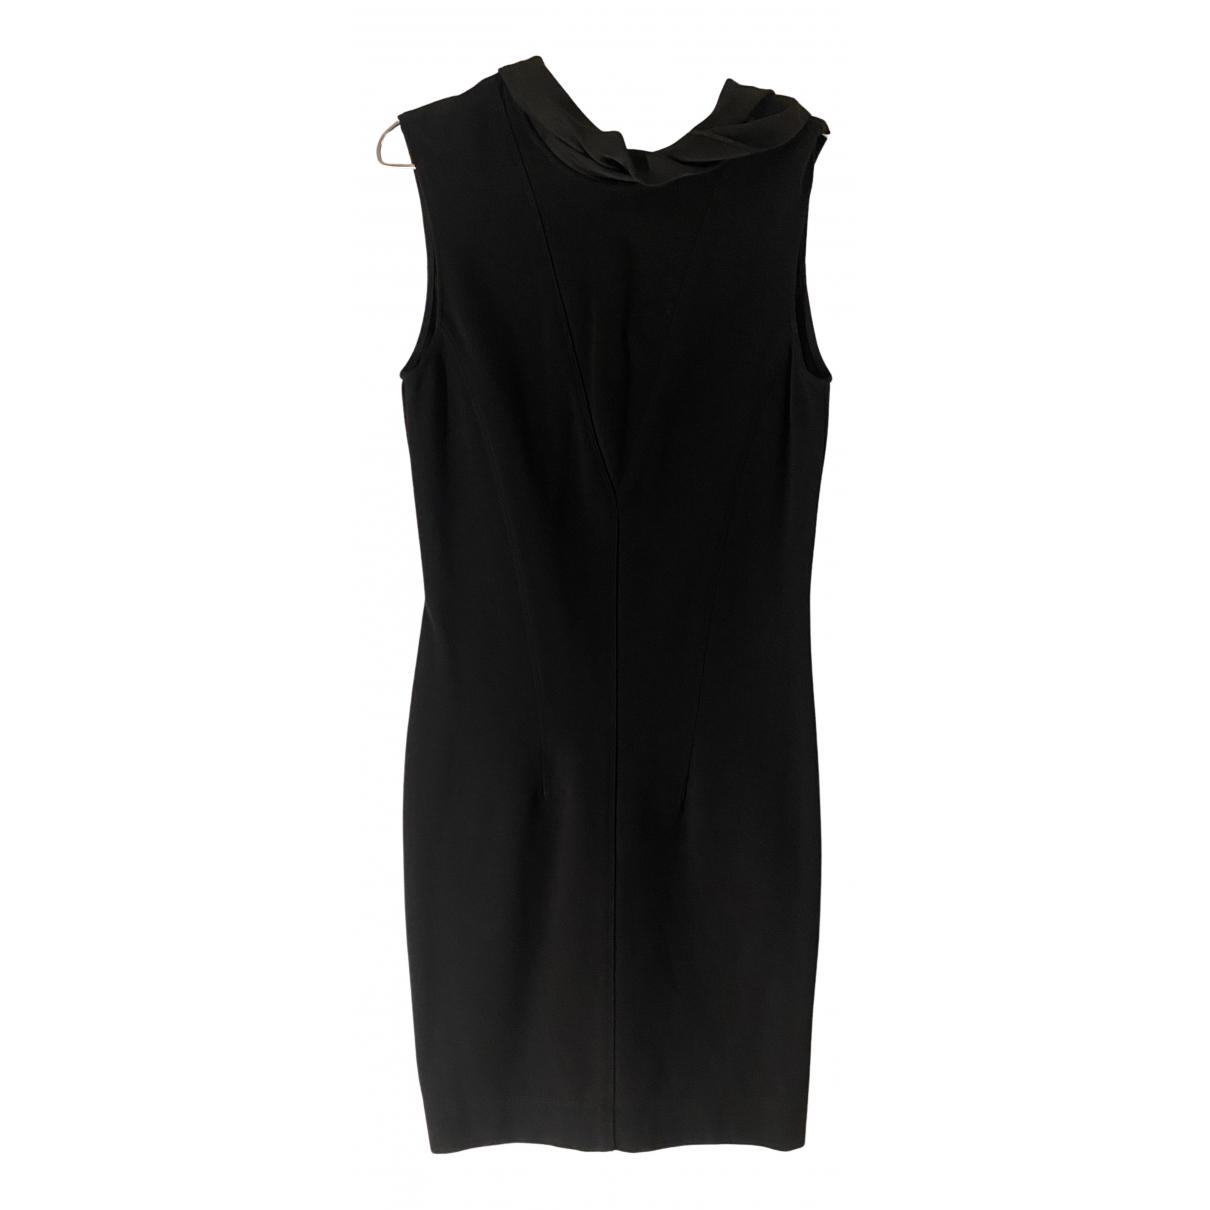 Sandro \N Kleid in  Schwarz Synthetik